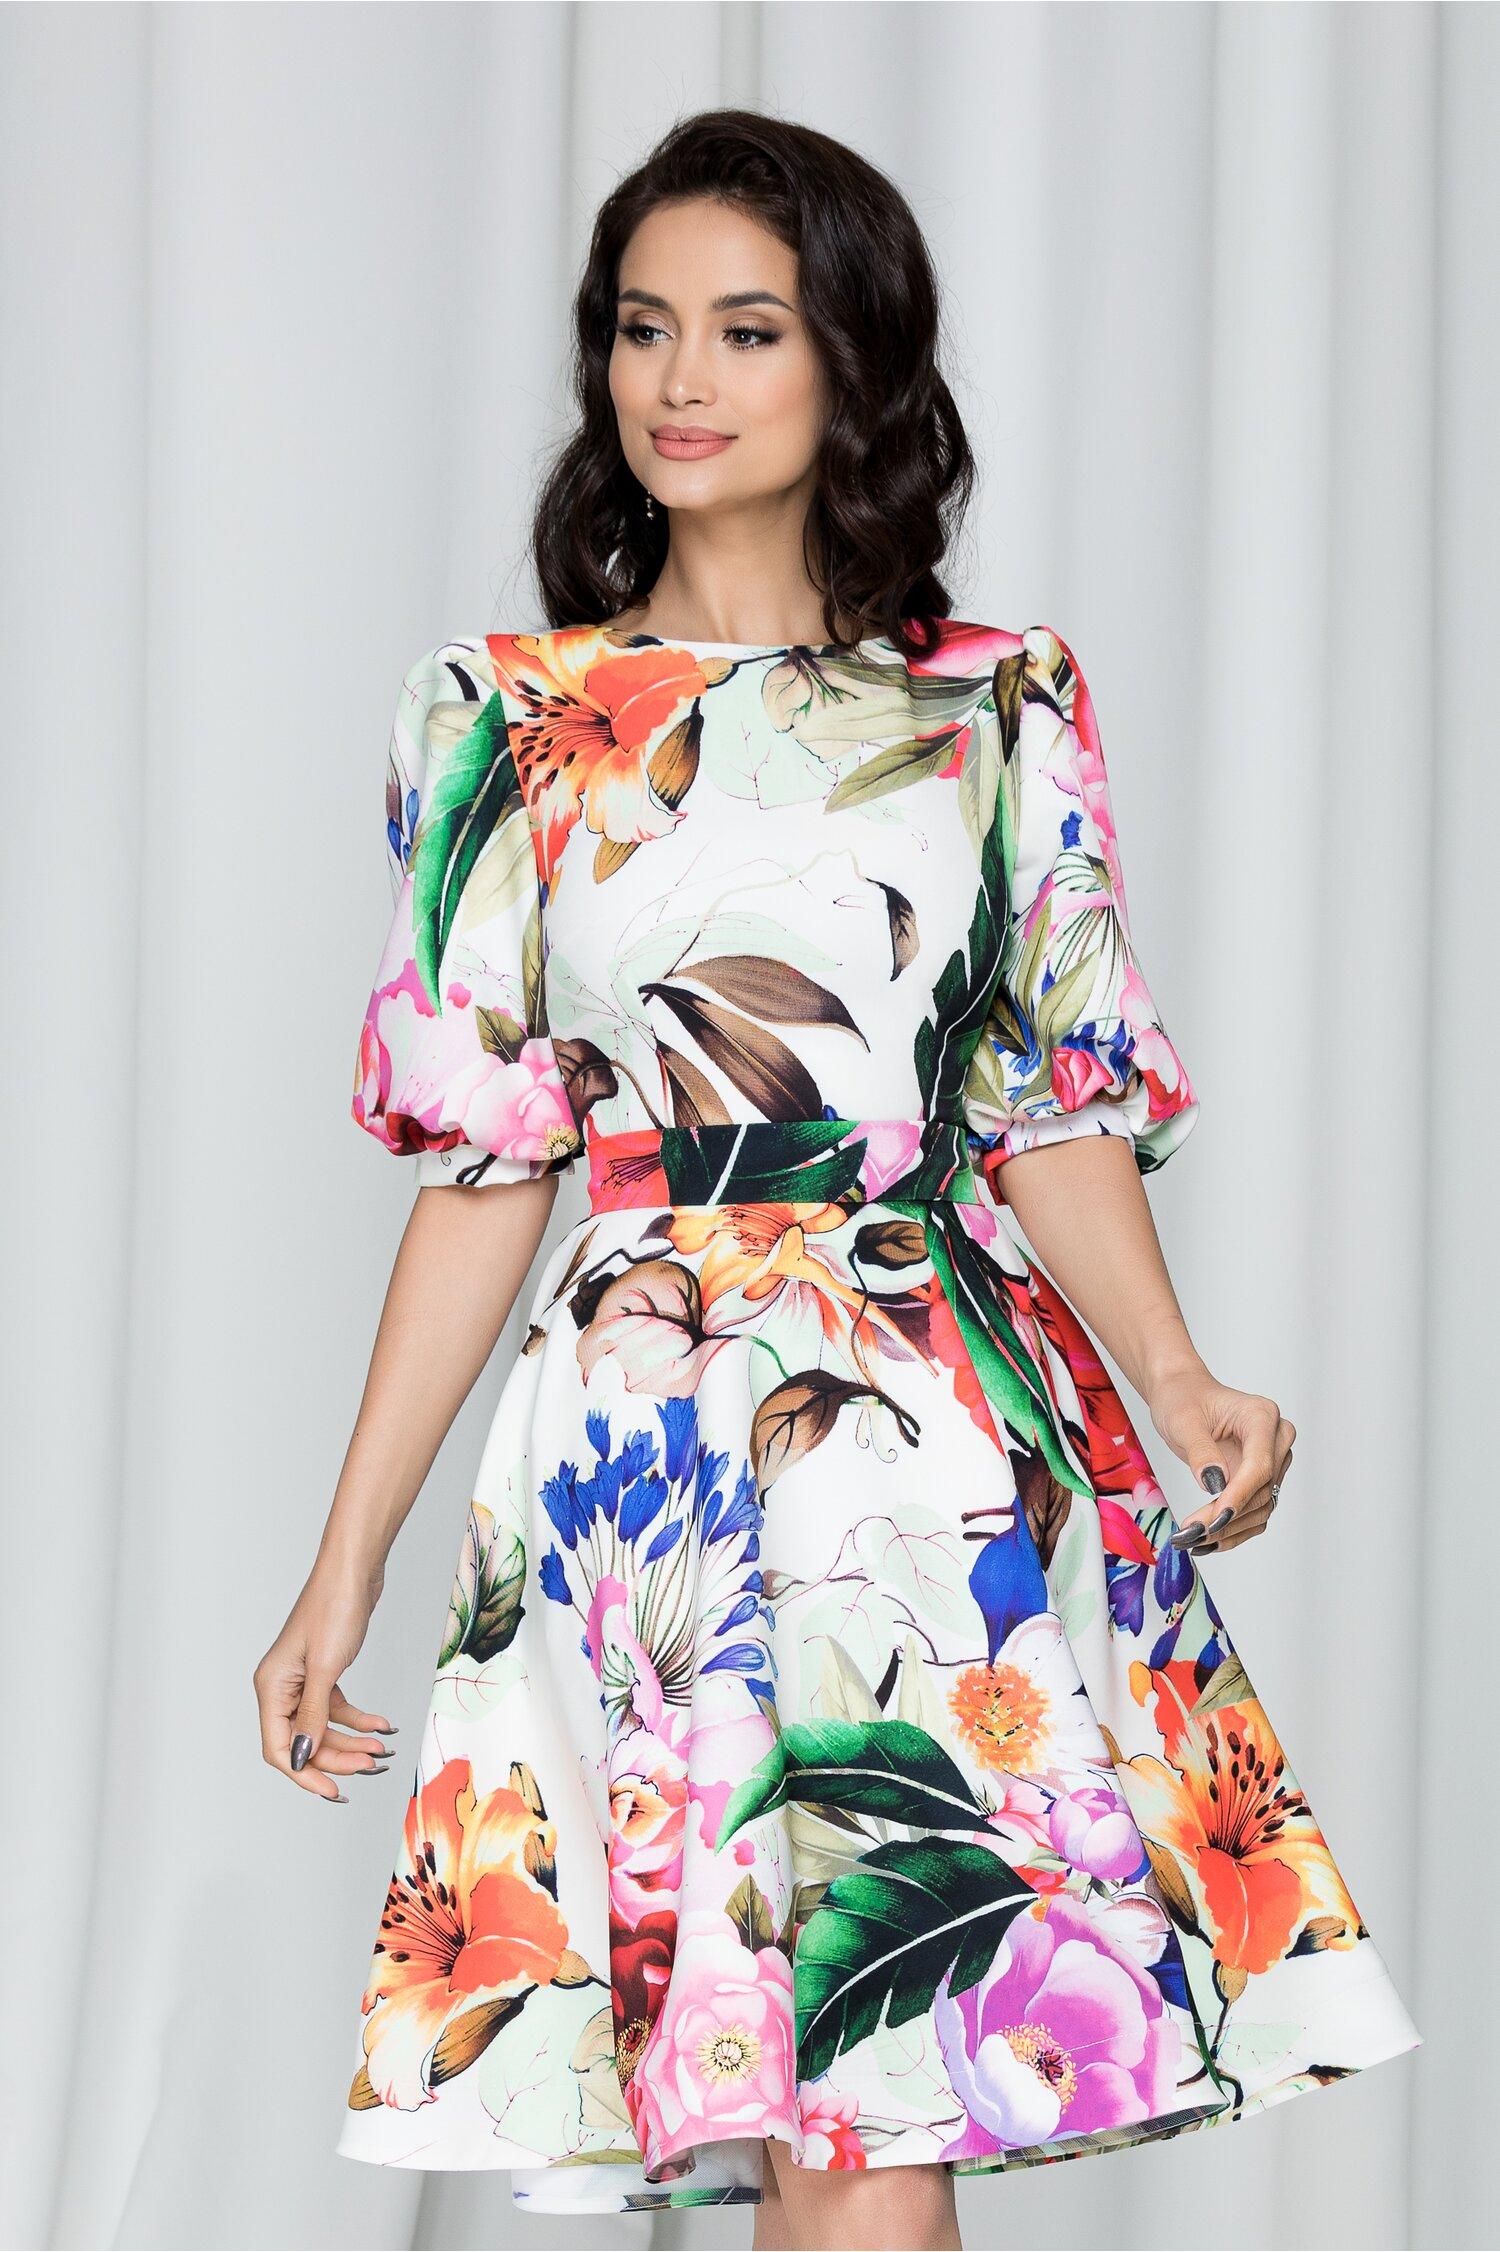 Rochie MBG alba cu imprimeu floral multicolor cu maneci bufante